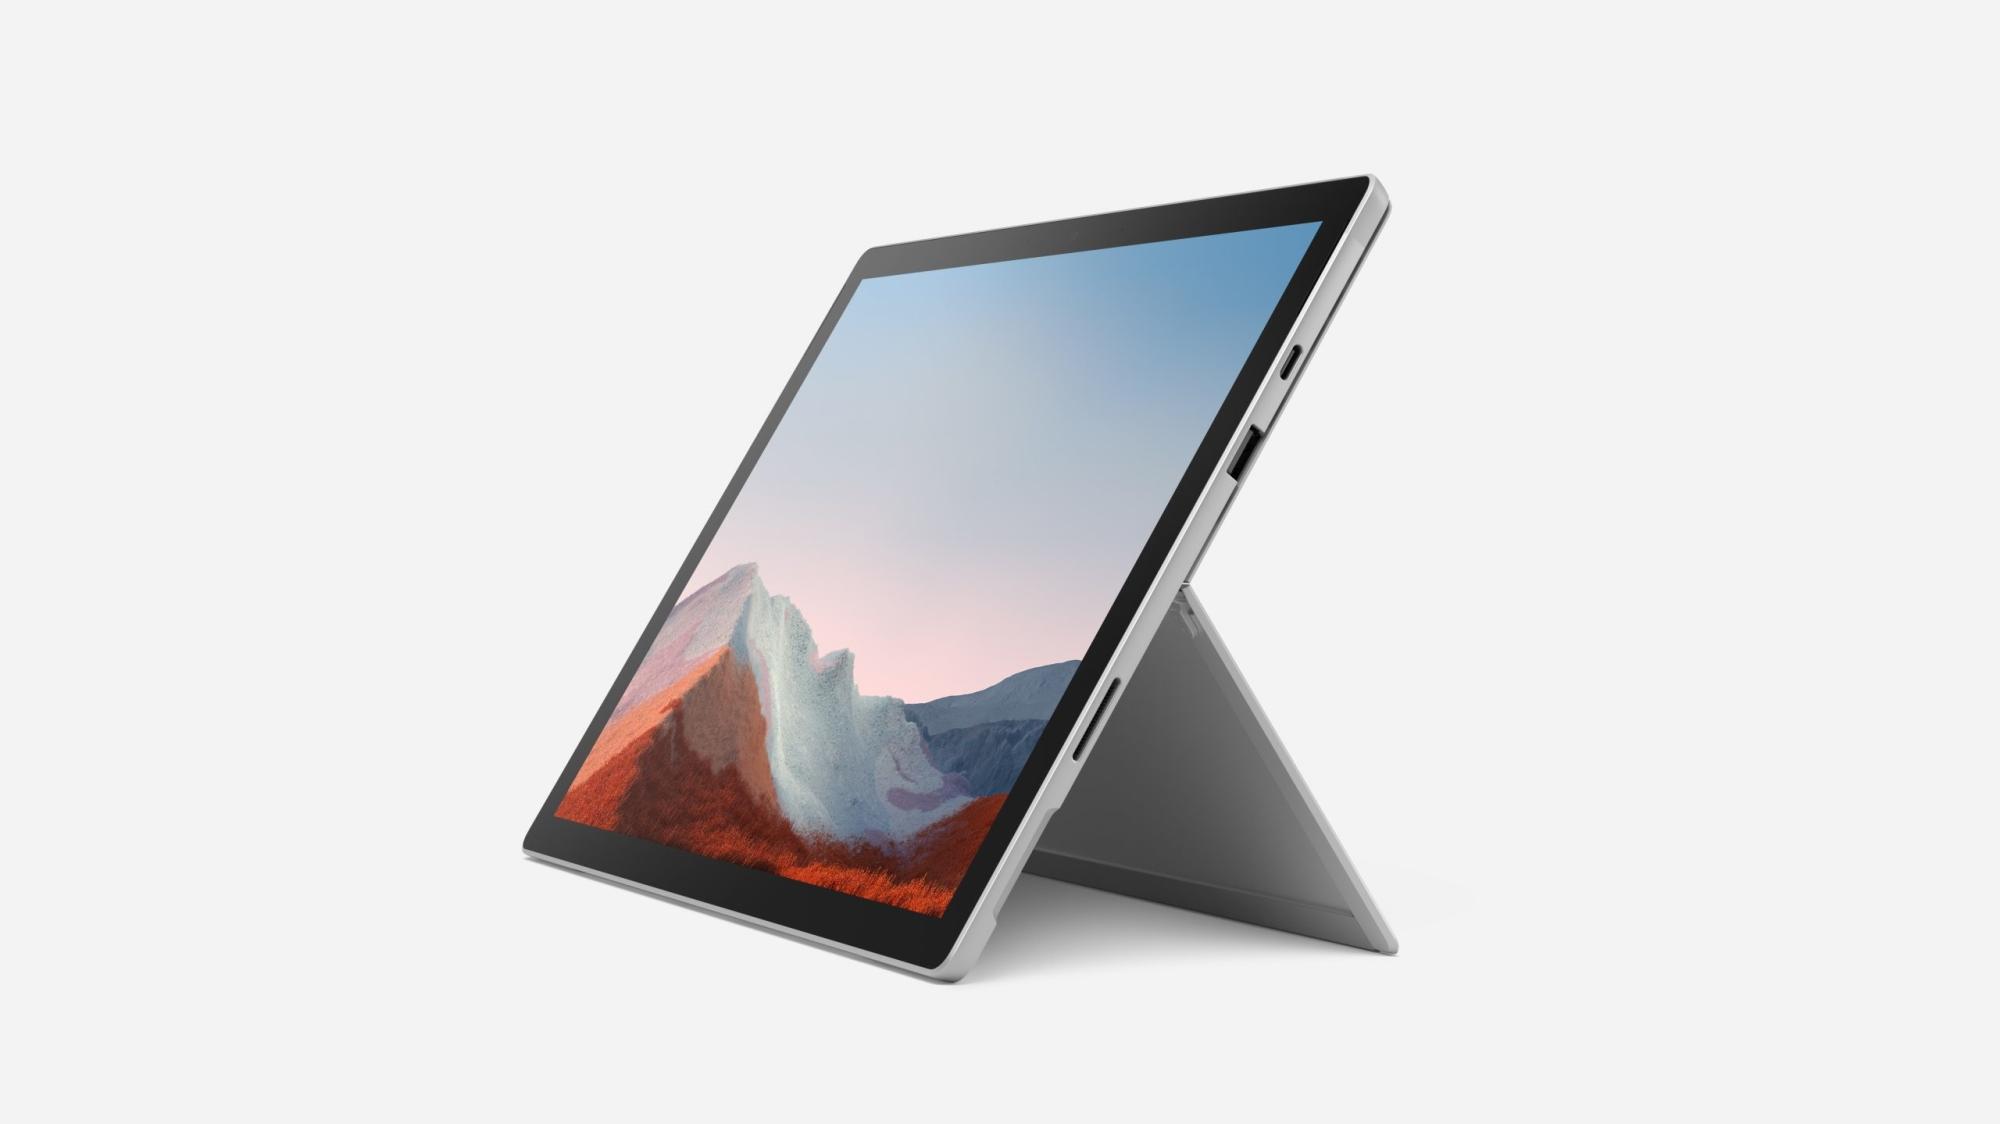 Surface Pro 7+ 512 Gb 31,2 Cm (12.3) Intel® Core™ I7 De 11ma Generación 16 Gb Wi-fi 6 (802.11ax) Windows 10 Pro Platino